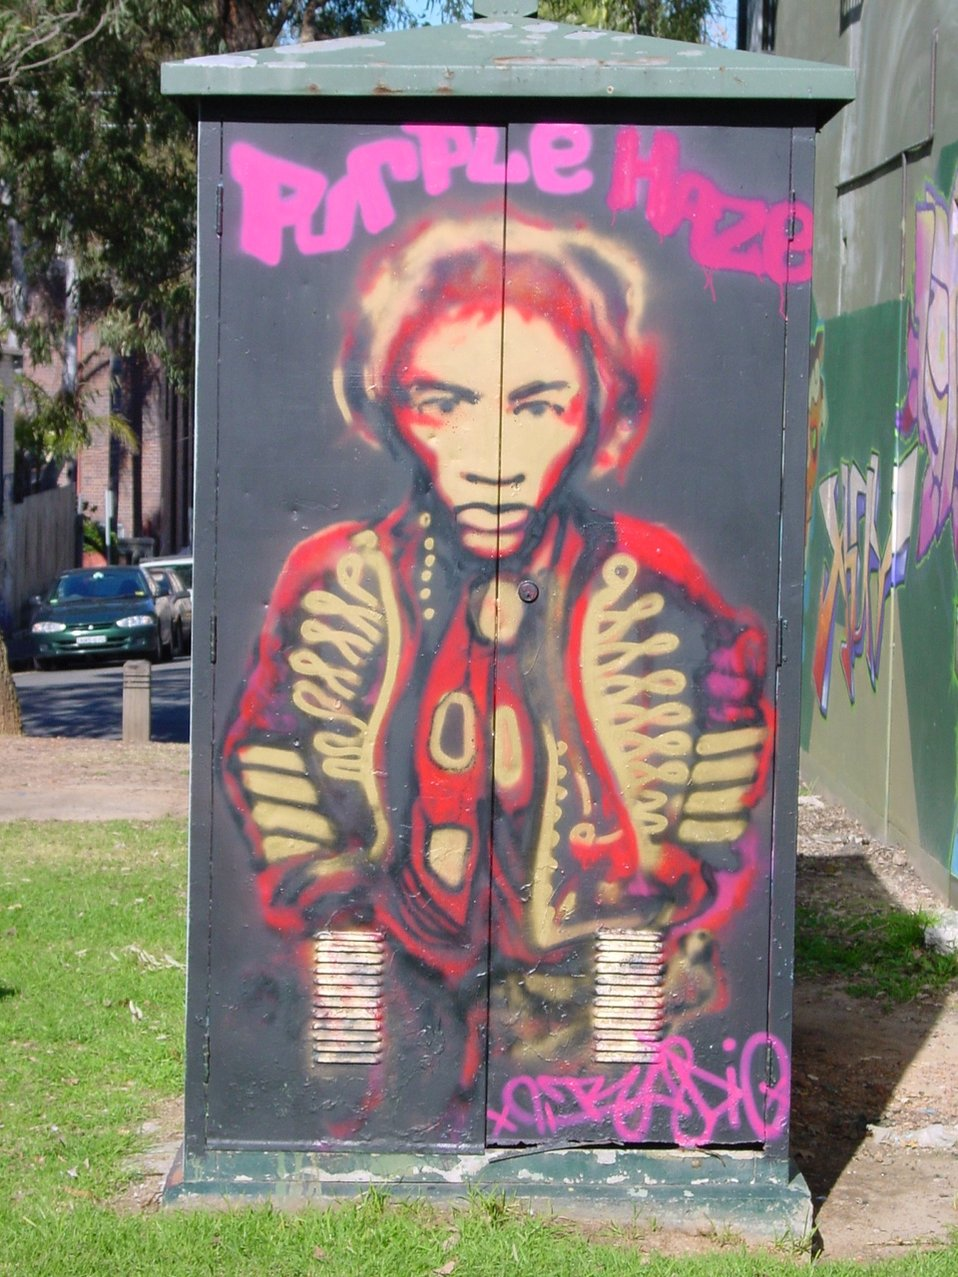 Jimi Hendrix 'Purple Haze' graffiti, Camperdown Memorial Rest Park; May 2005 (Photo: Duncan Kimball)